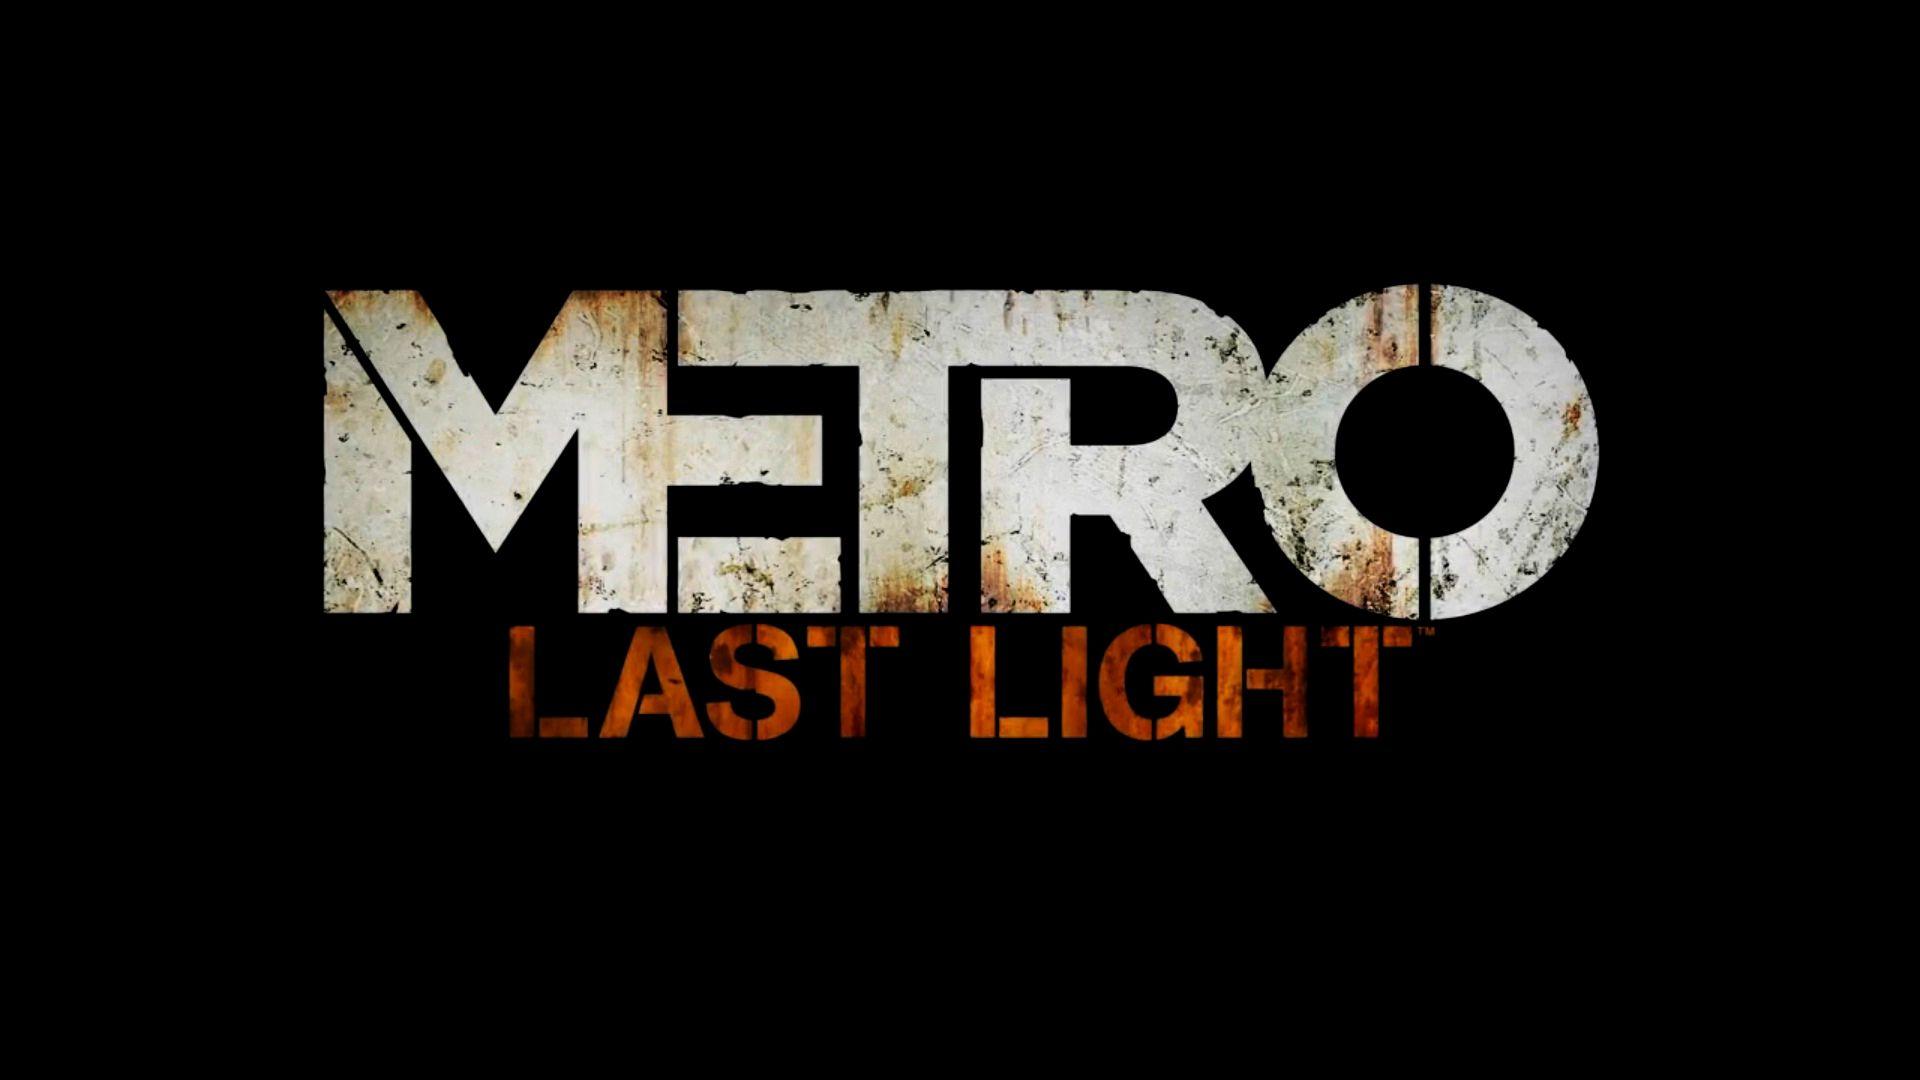 Metro-Last-Light-Logo-HD-Video-Games-Wallpapers.jpg (1920×1080)